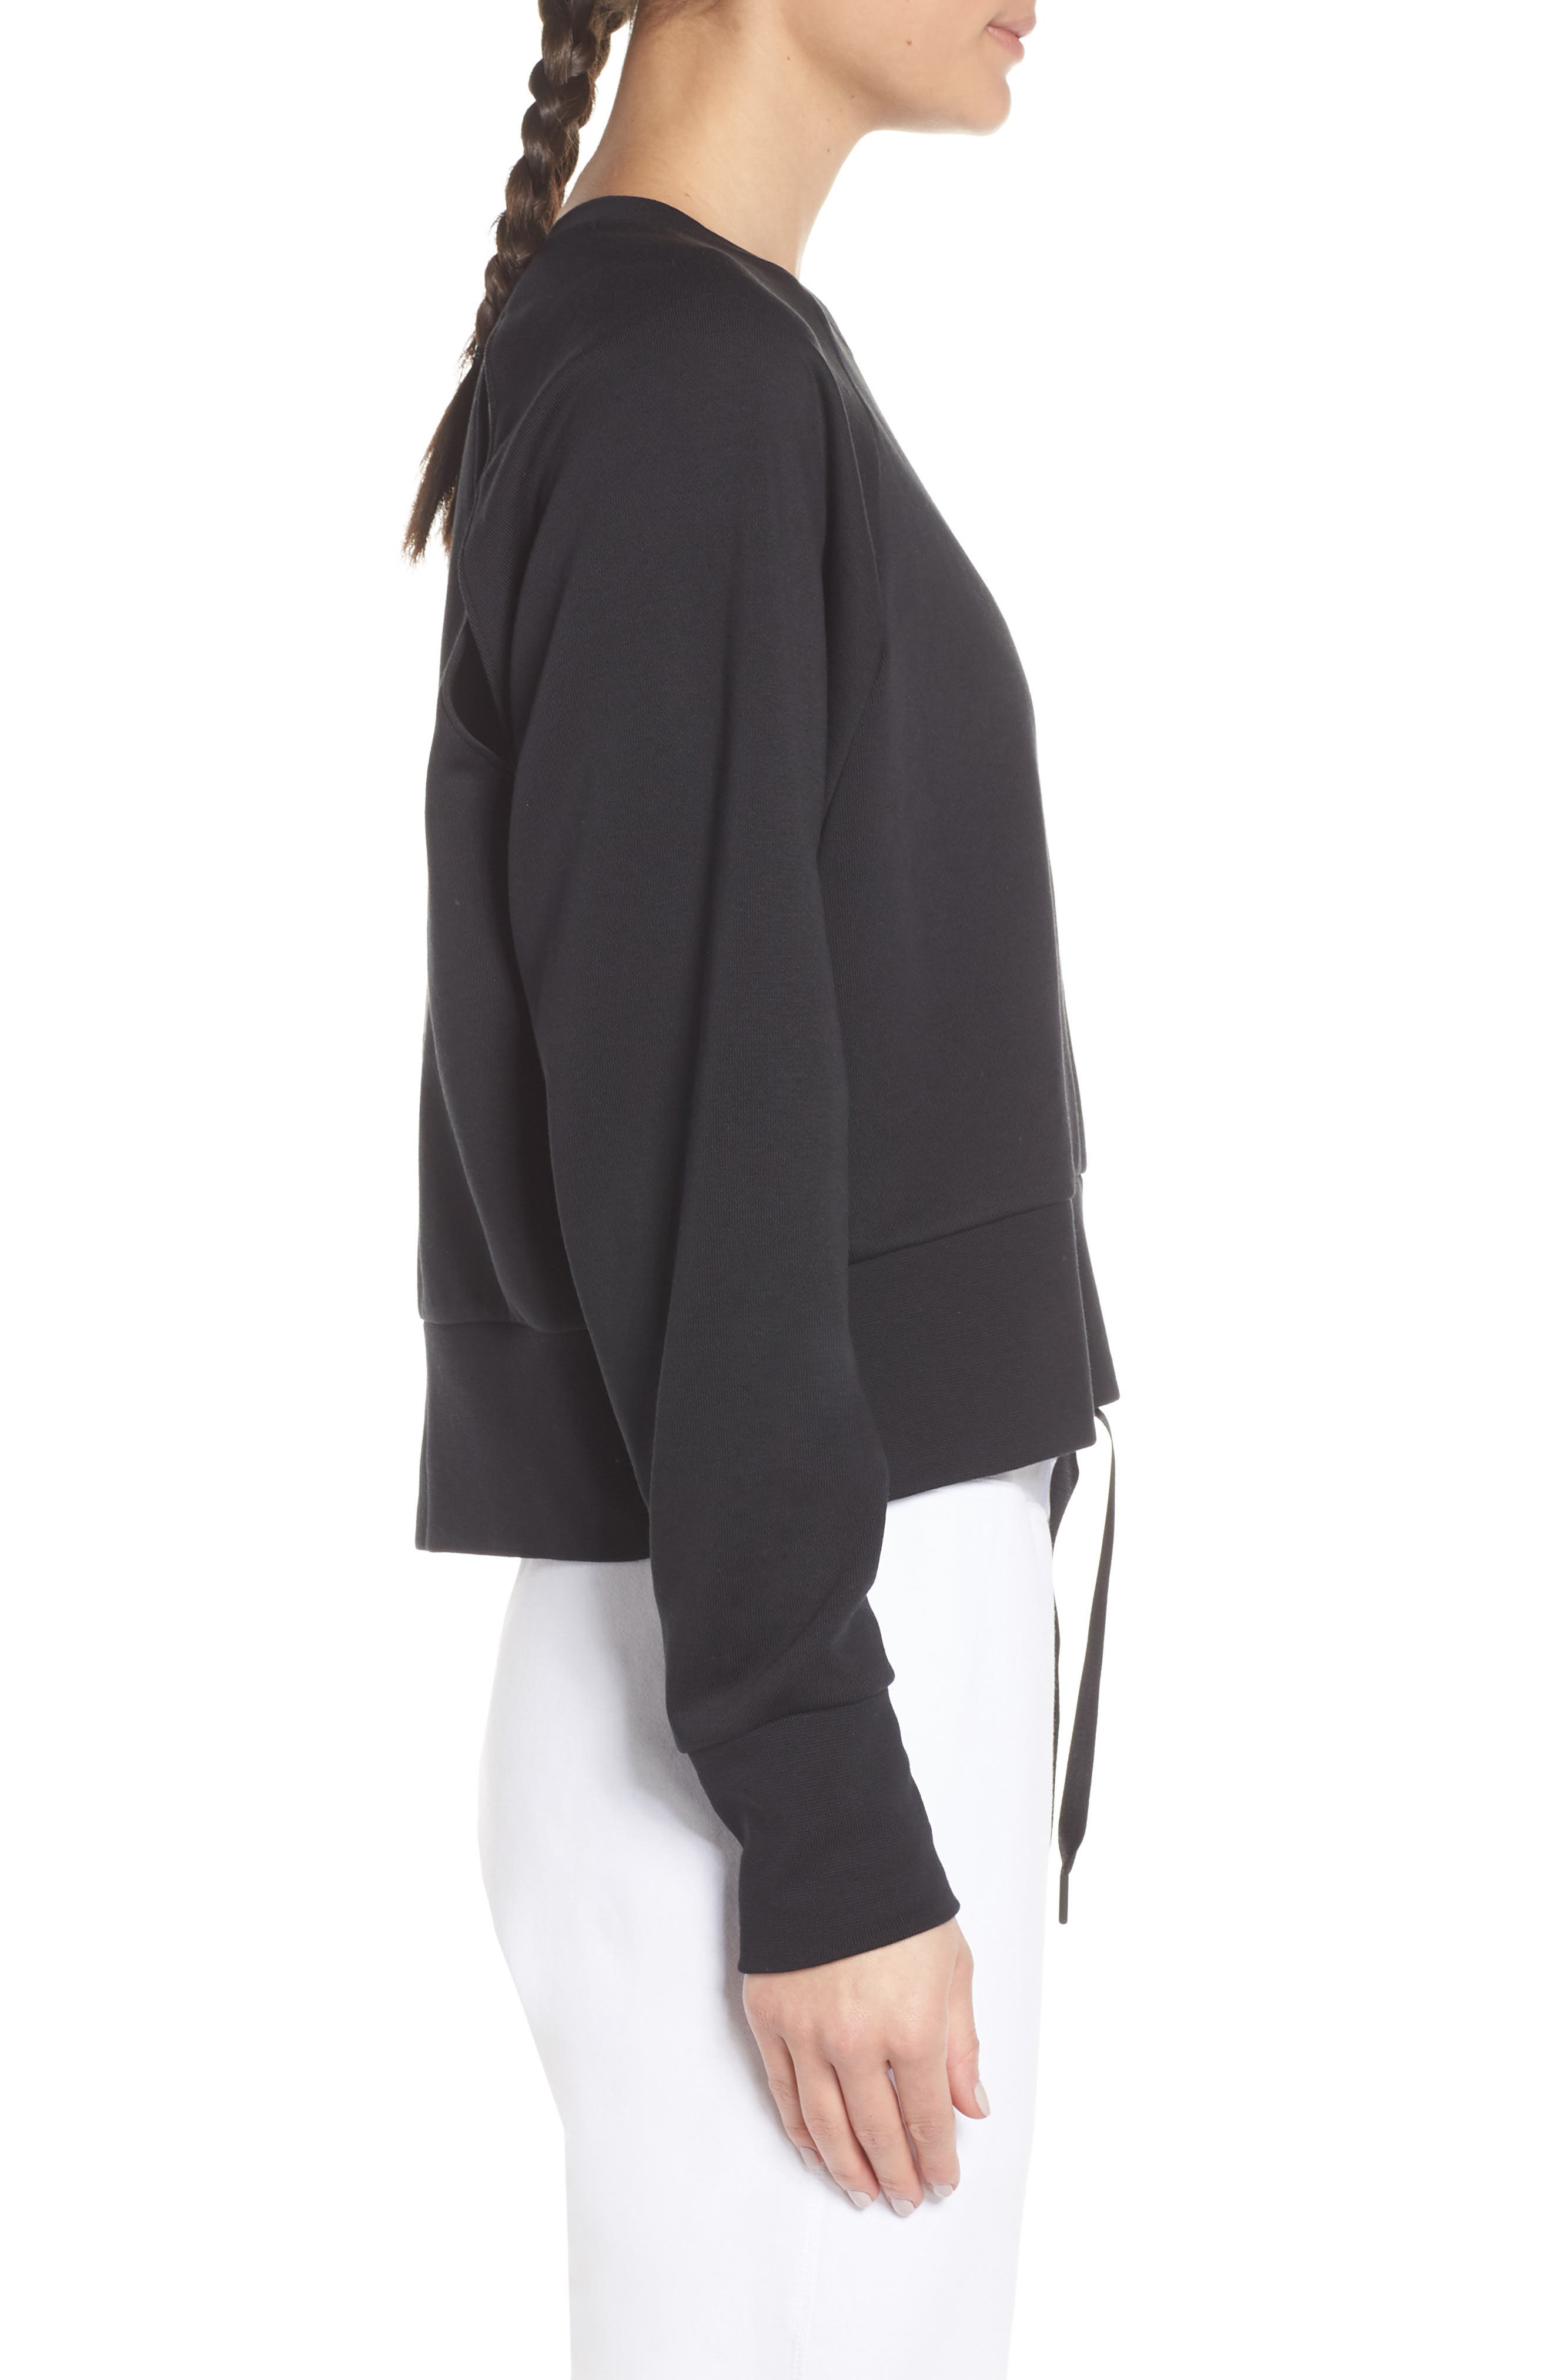 NIKE, Dry Cropped Training Sweatshirt, Alternate thumbnail 4, color, BLACK/ WHITE